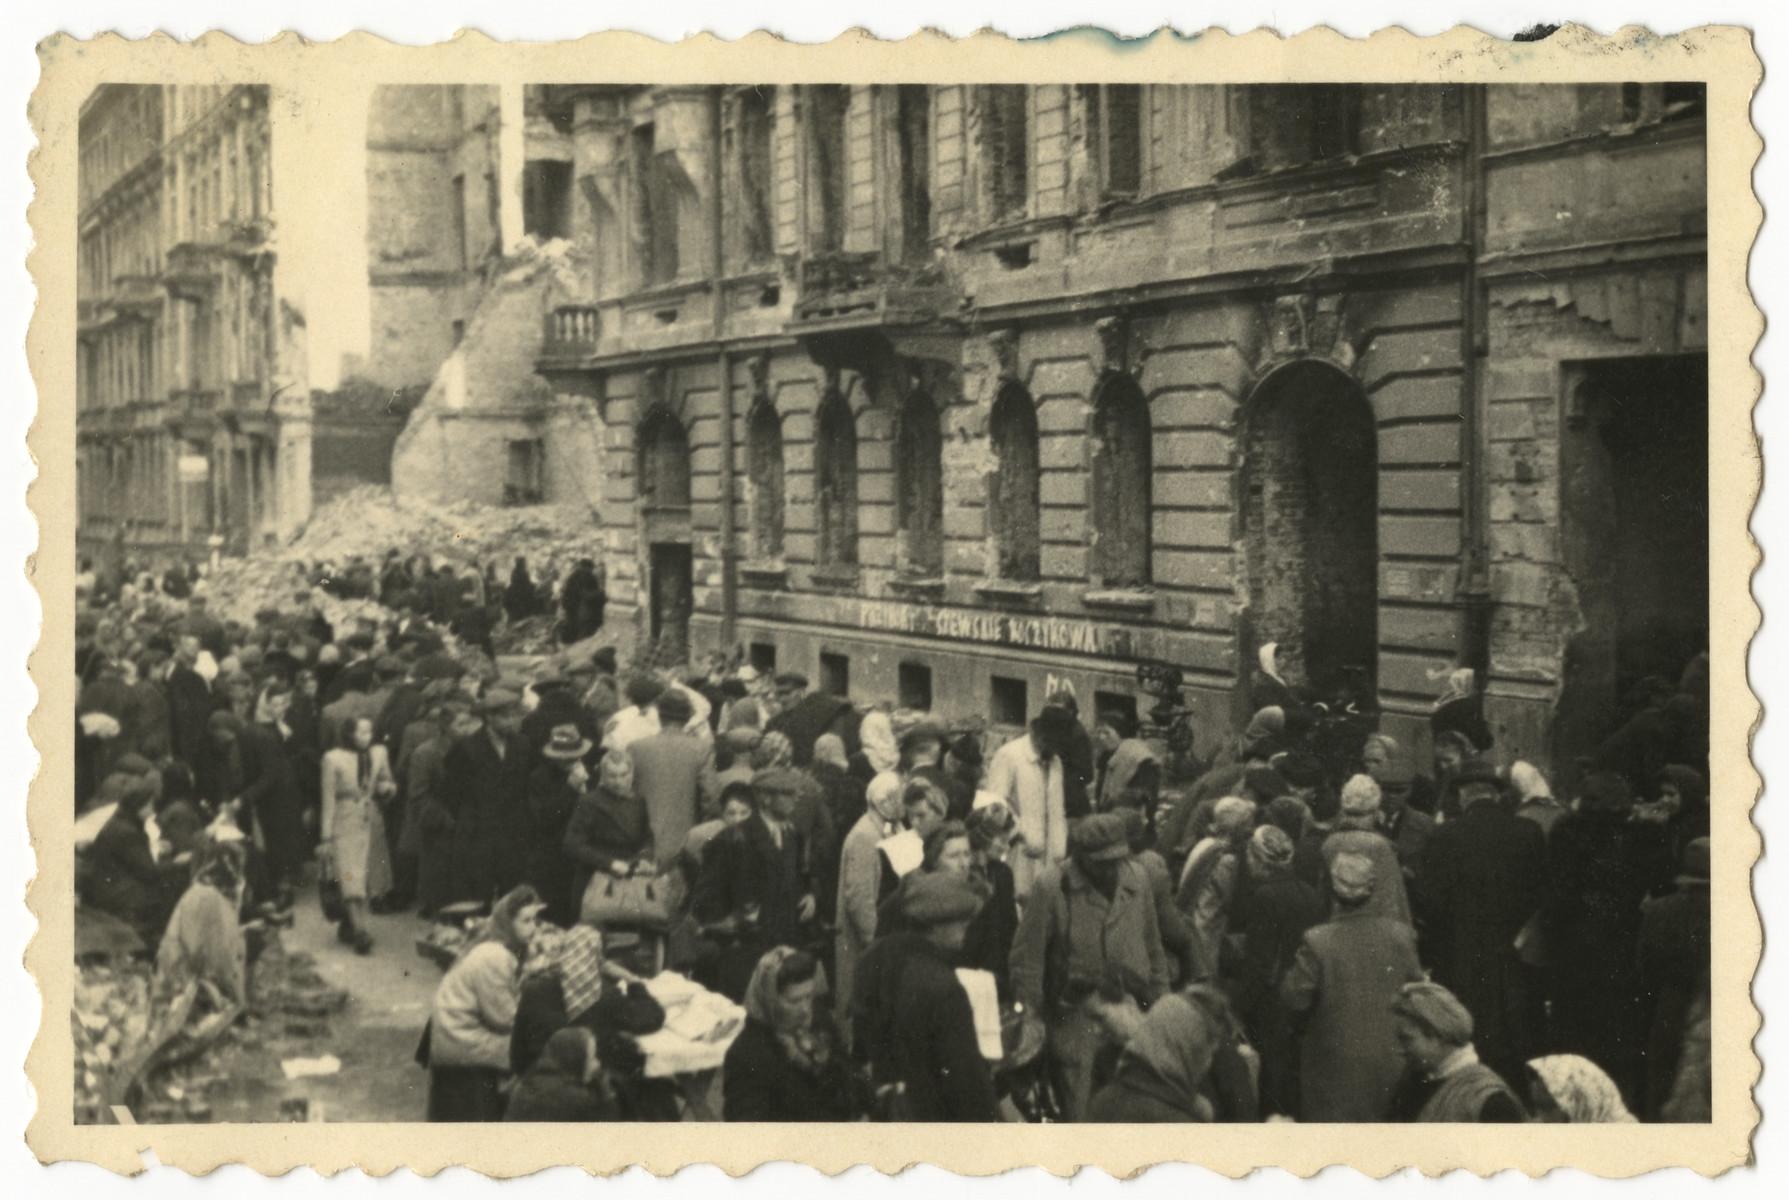 Polish men and women crowd into an outdoor market in postwar Warsaw.